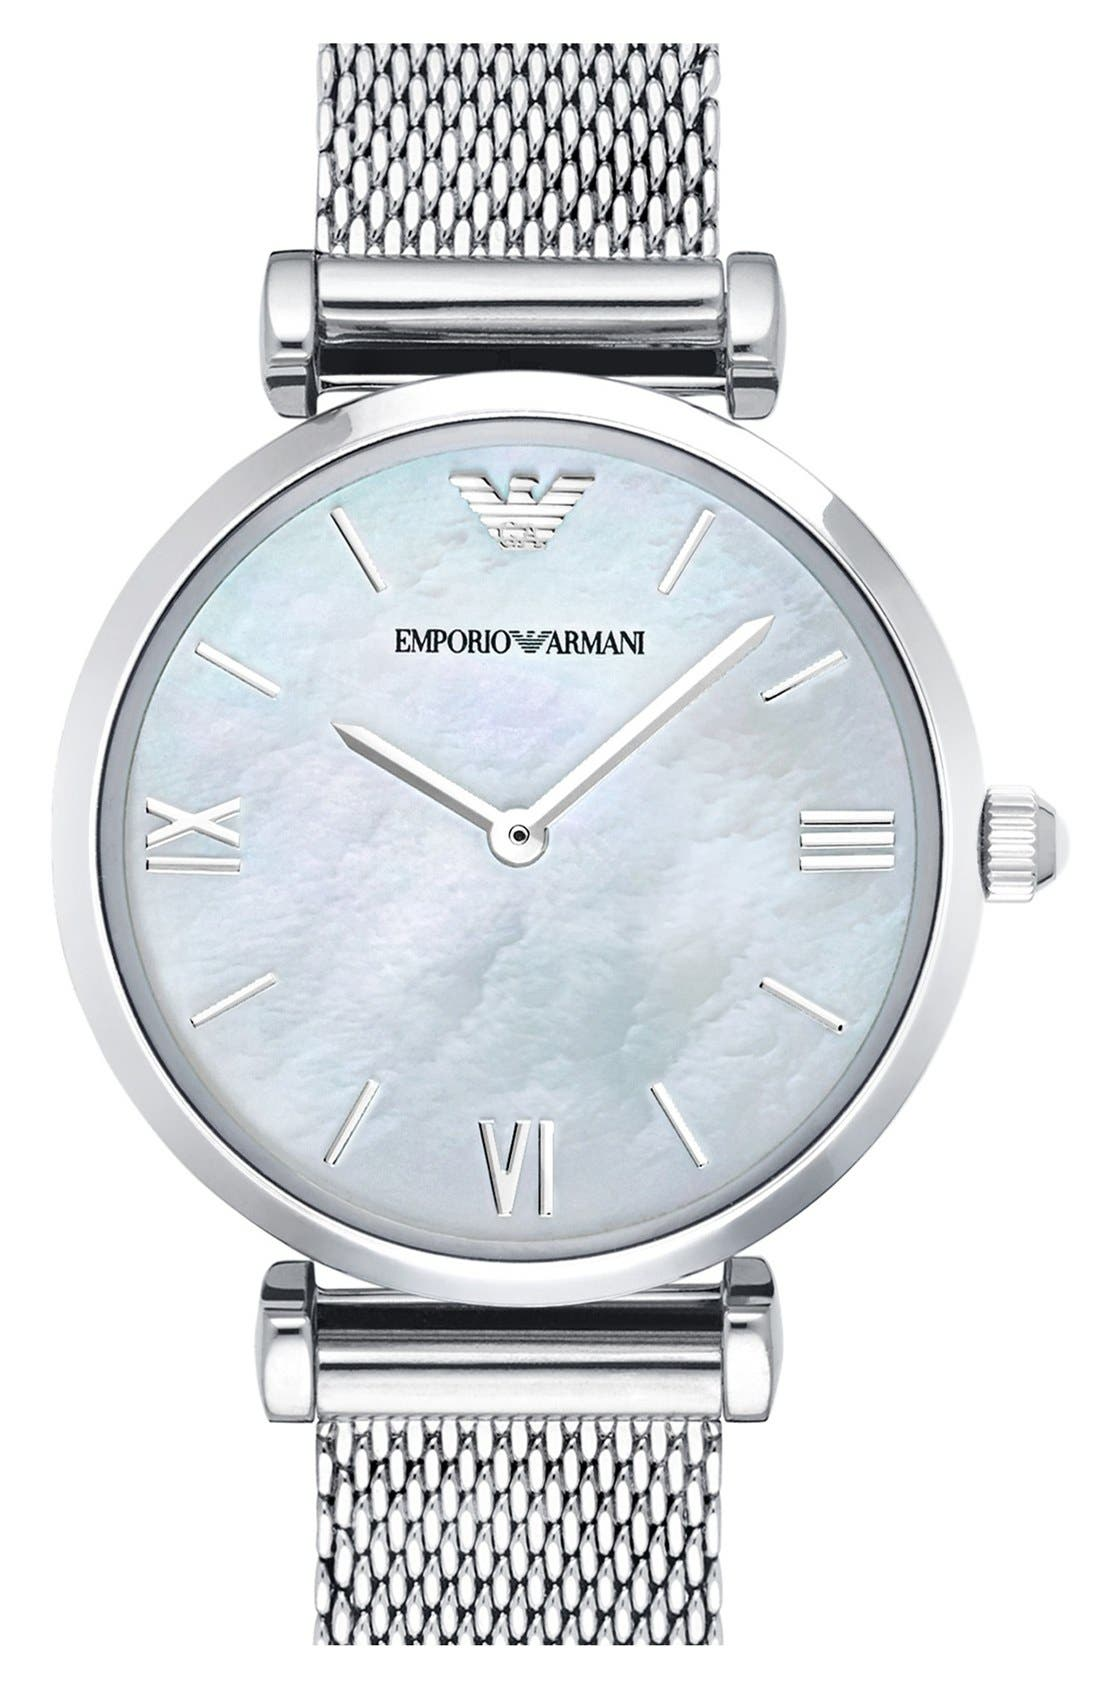 EMPORIO ARMANI Mesh Strap Watch, 32mm